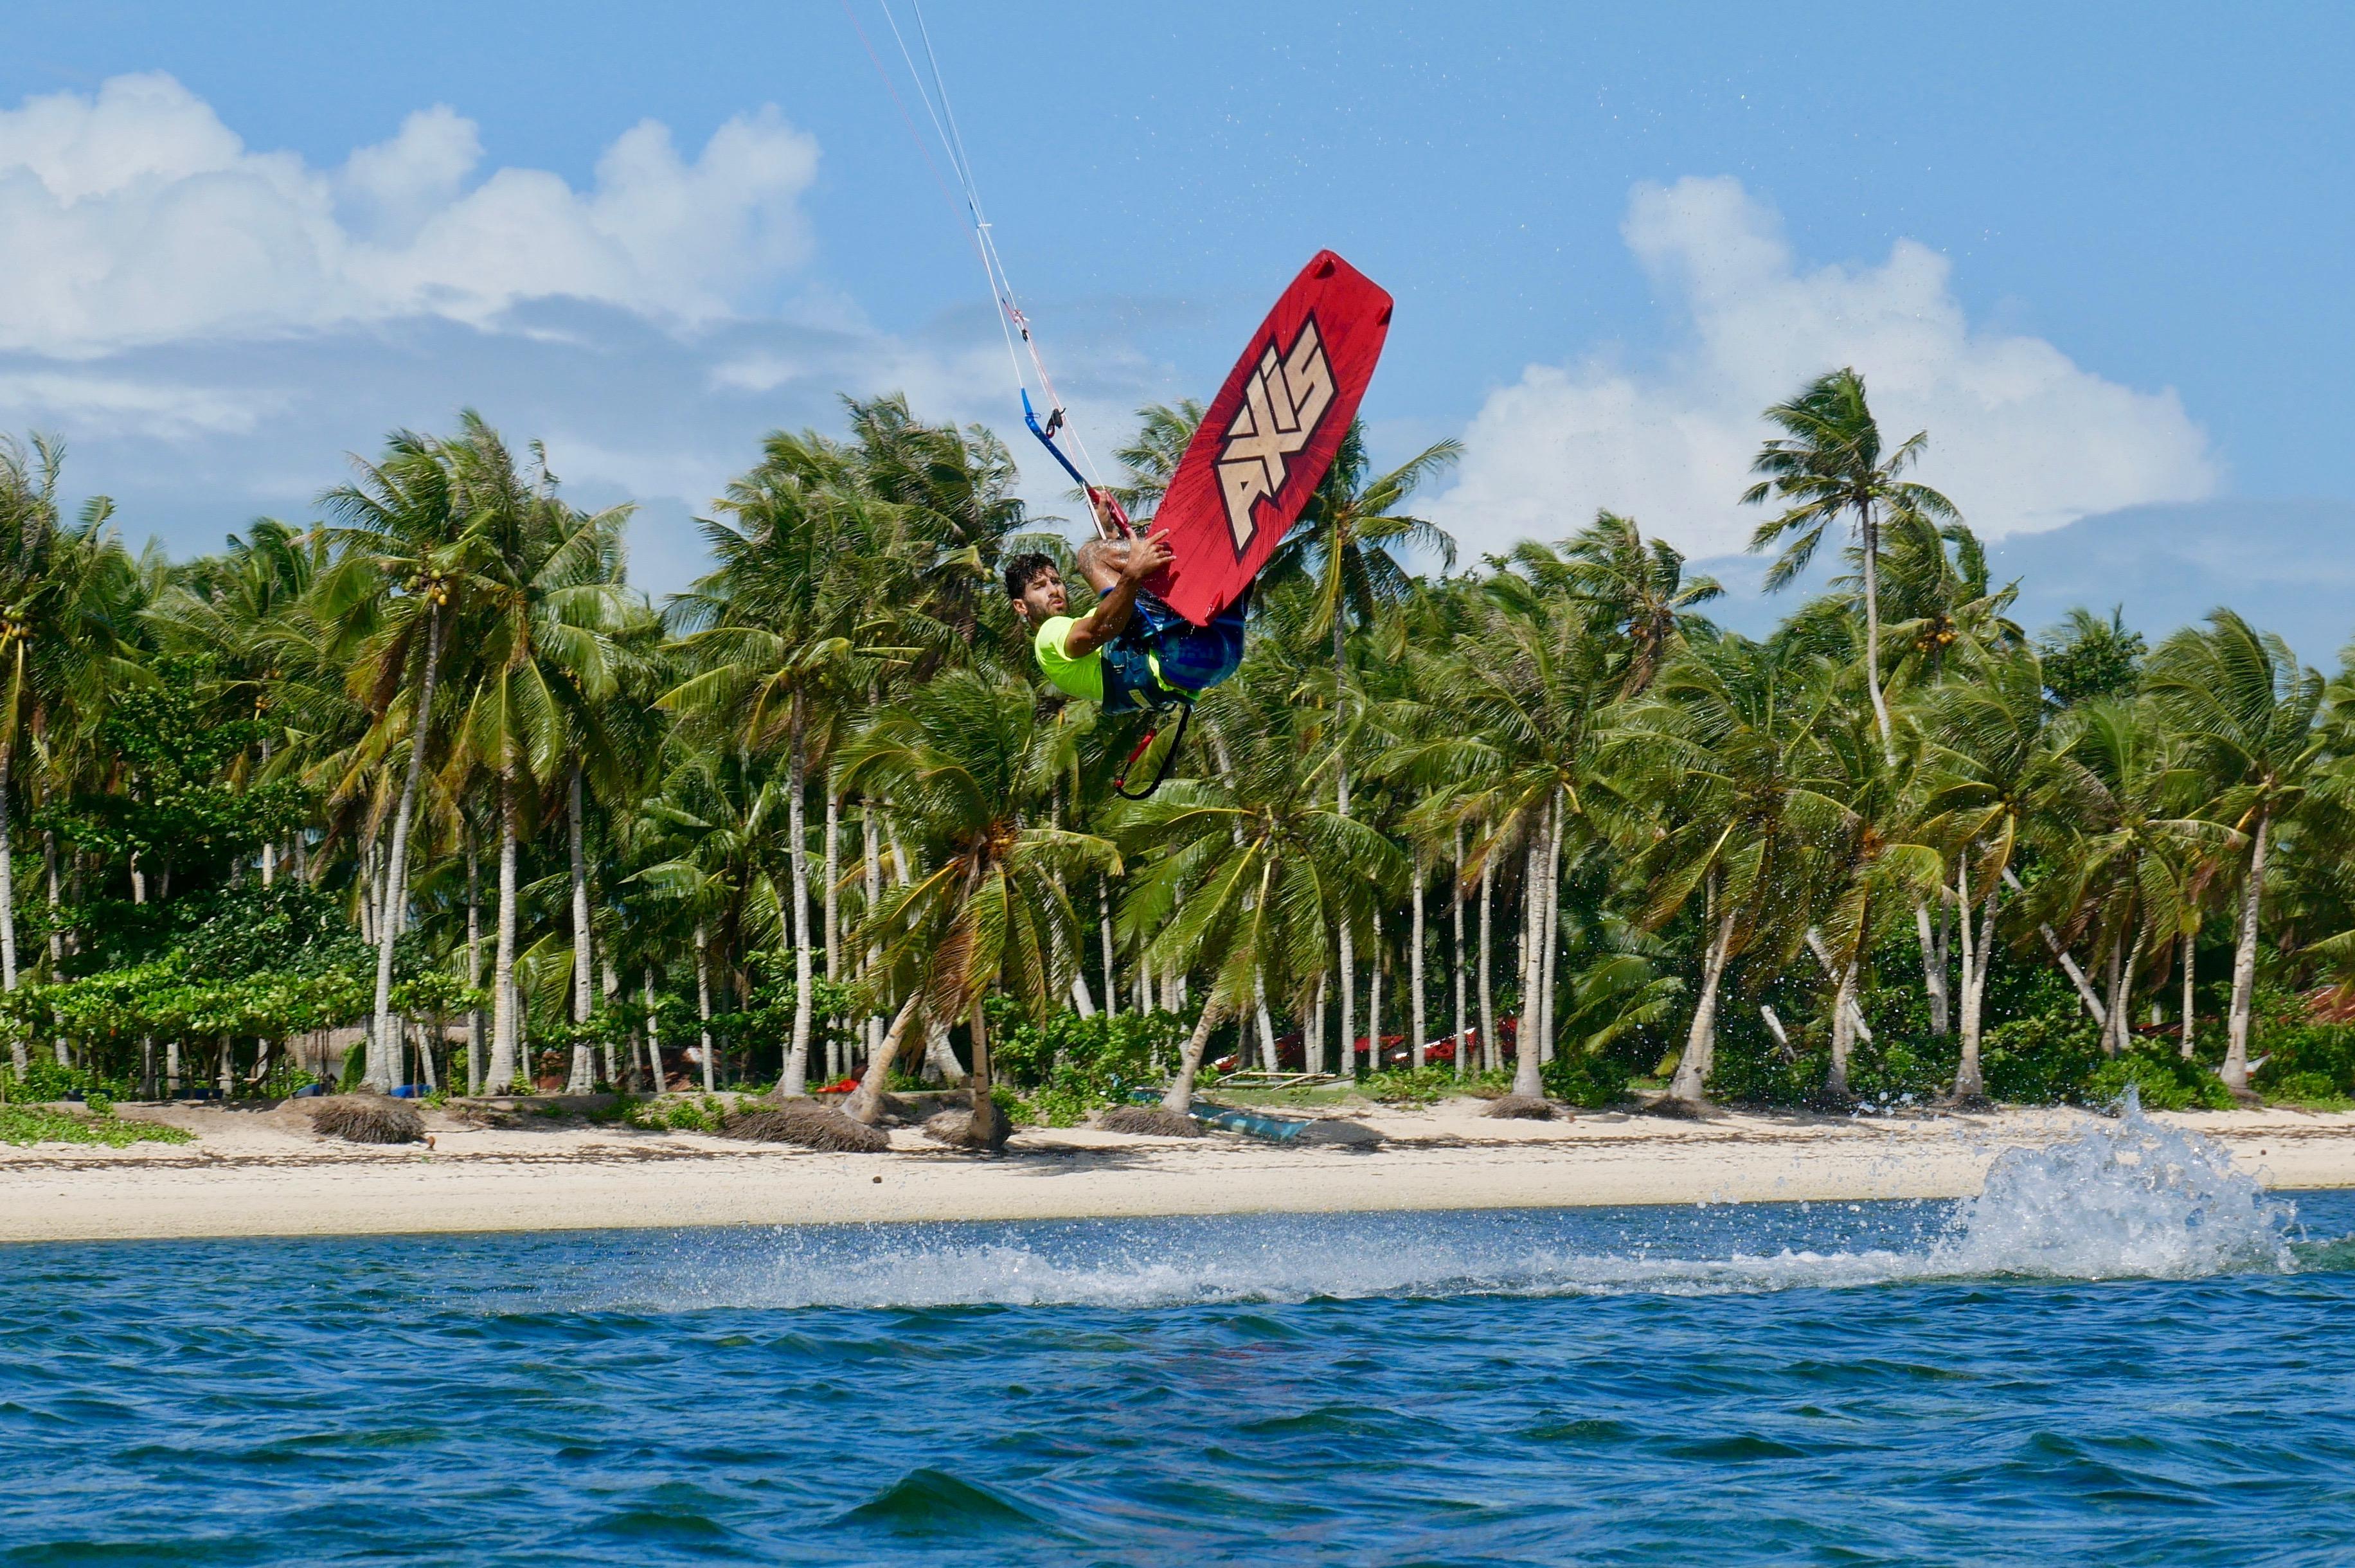 Kitesurf Philippines